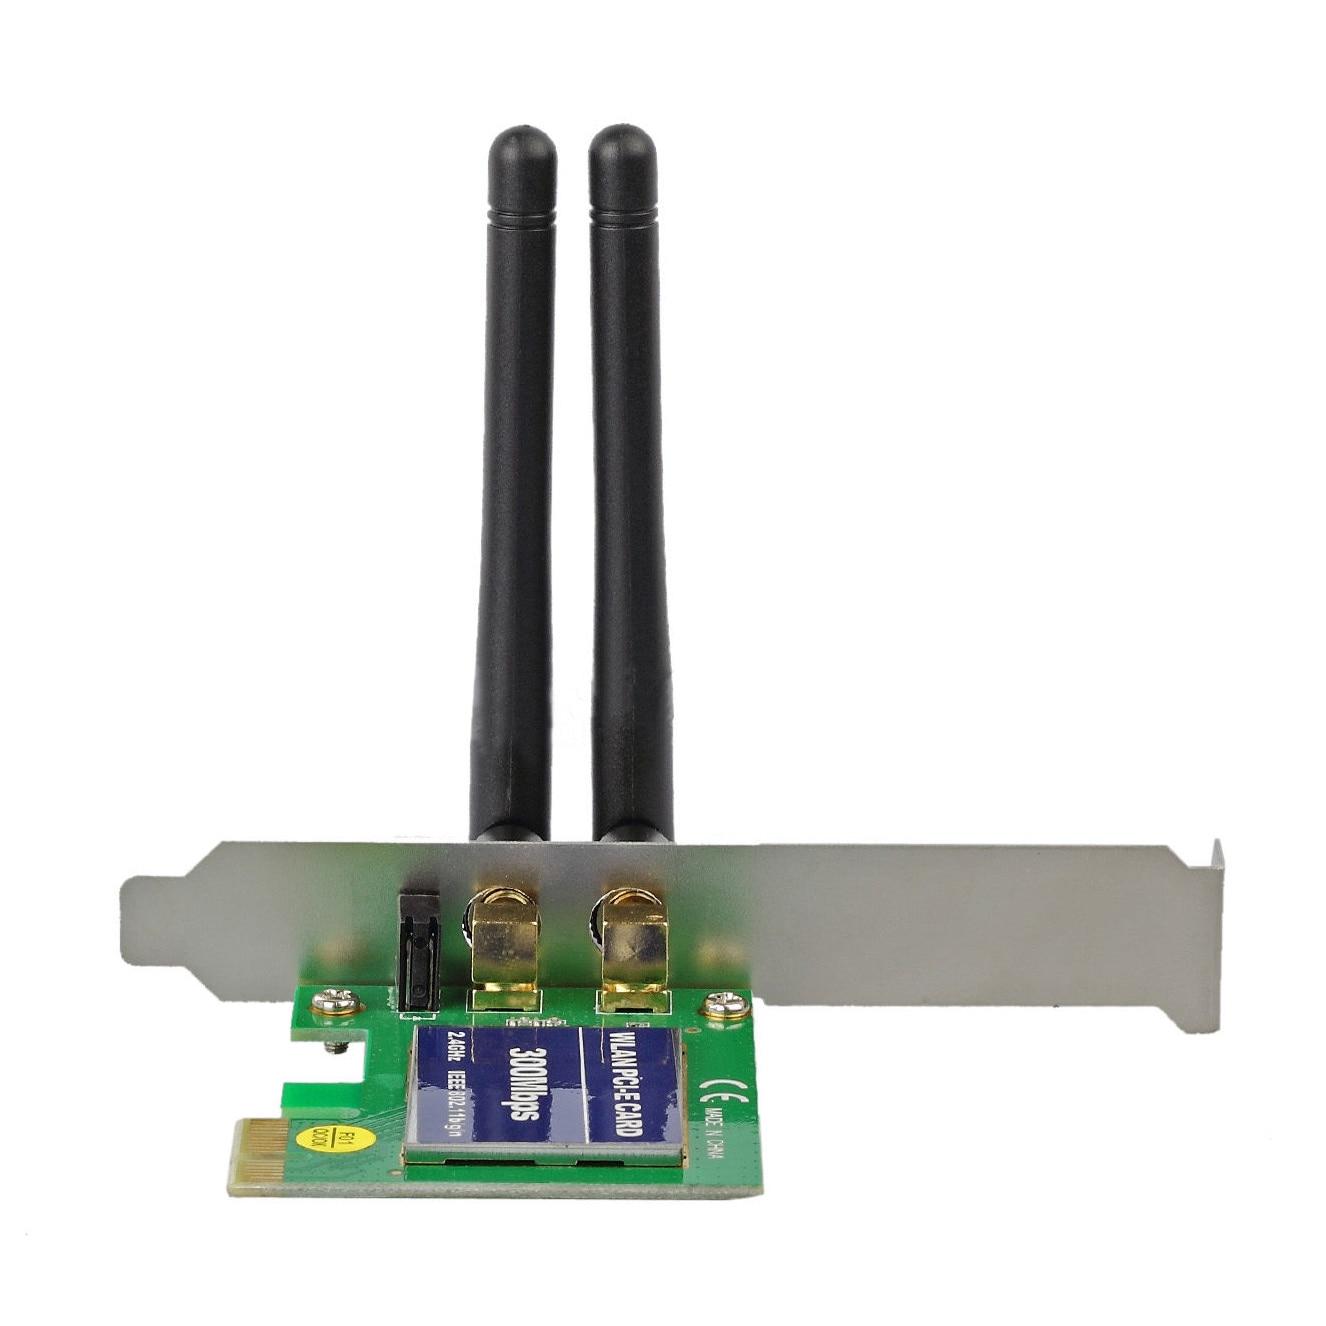 2 Antenna 300M Wireless PCI-E WiFi Network Adapter LAN Cards for Desktop PC